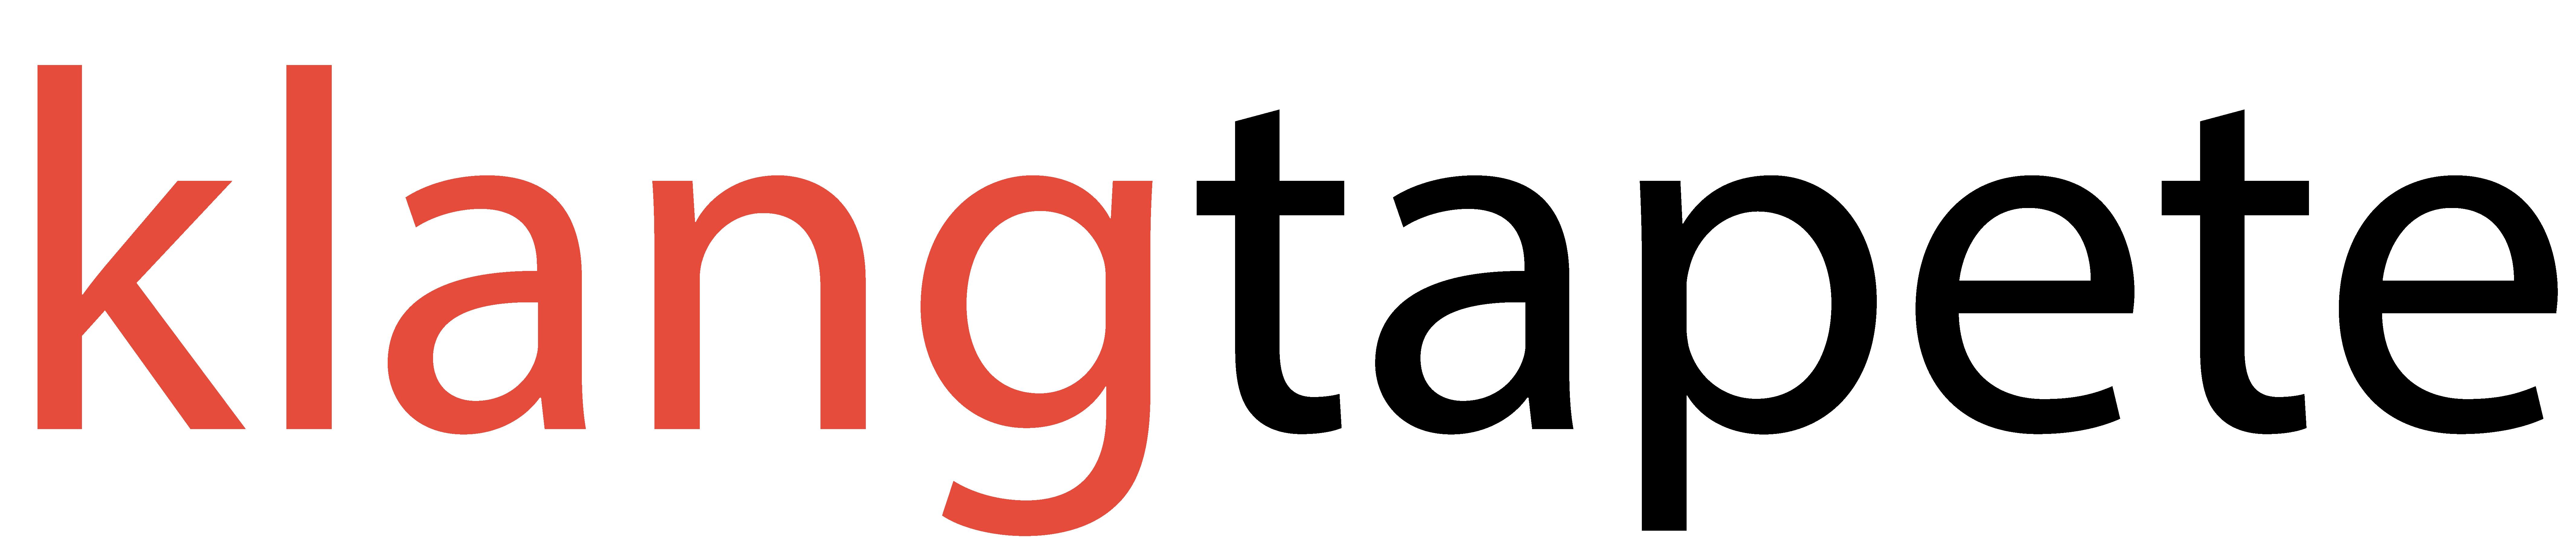 Banner klangtapete